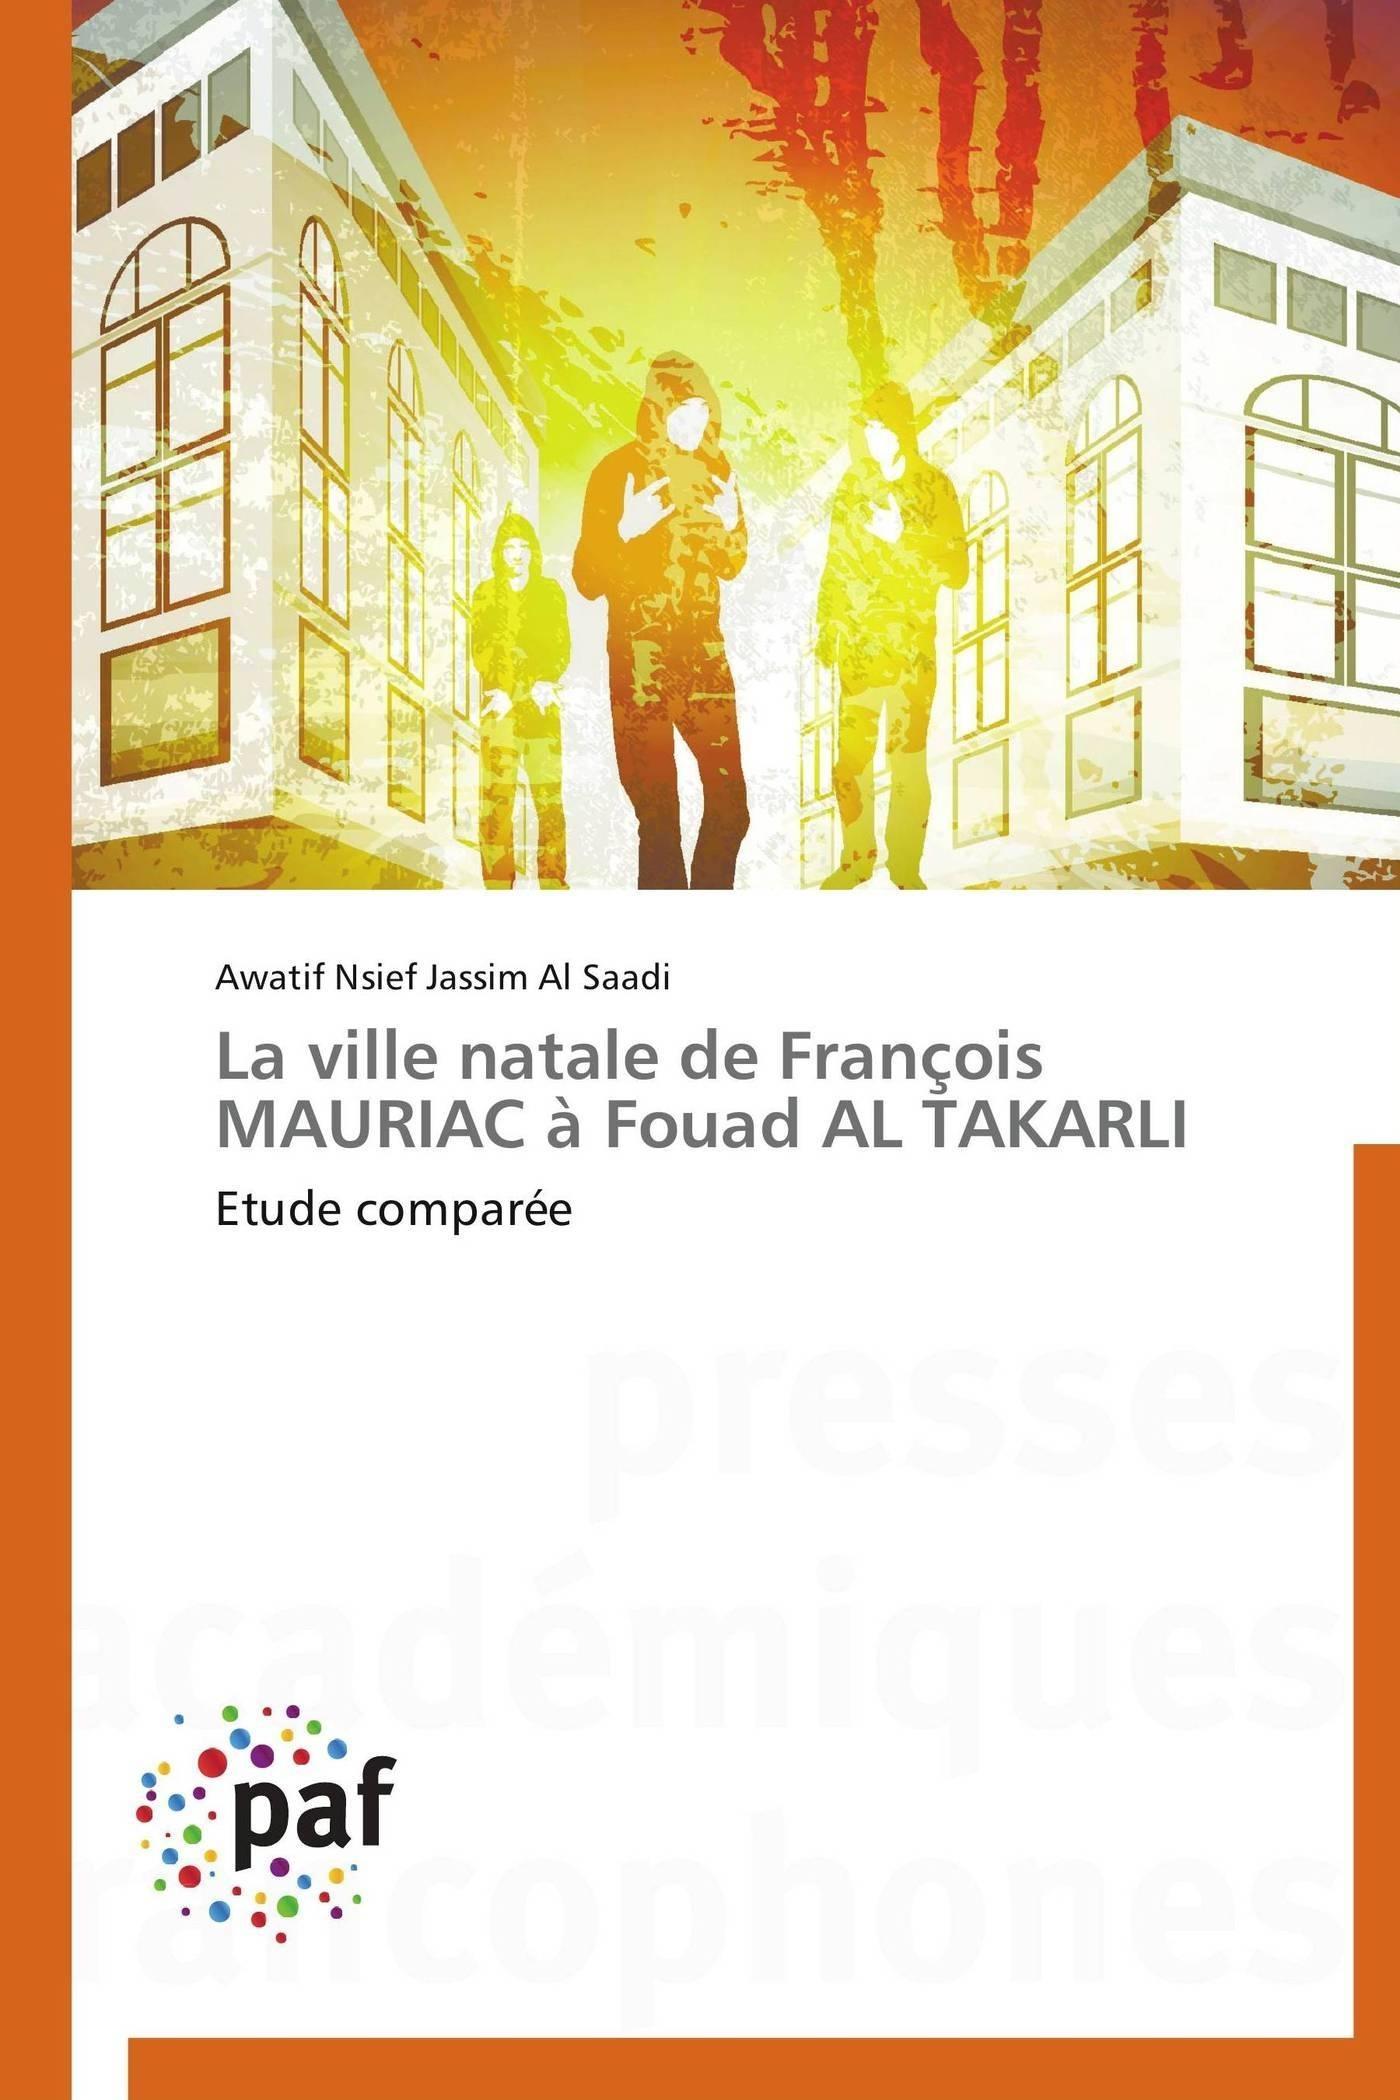 LA VILLE NATALE DE FRANCOIS MAURIAC A FOUAD AL TAKARLI